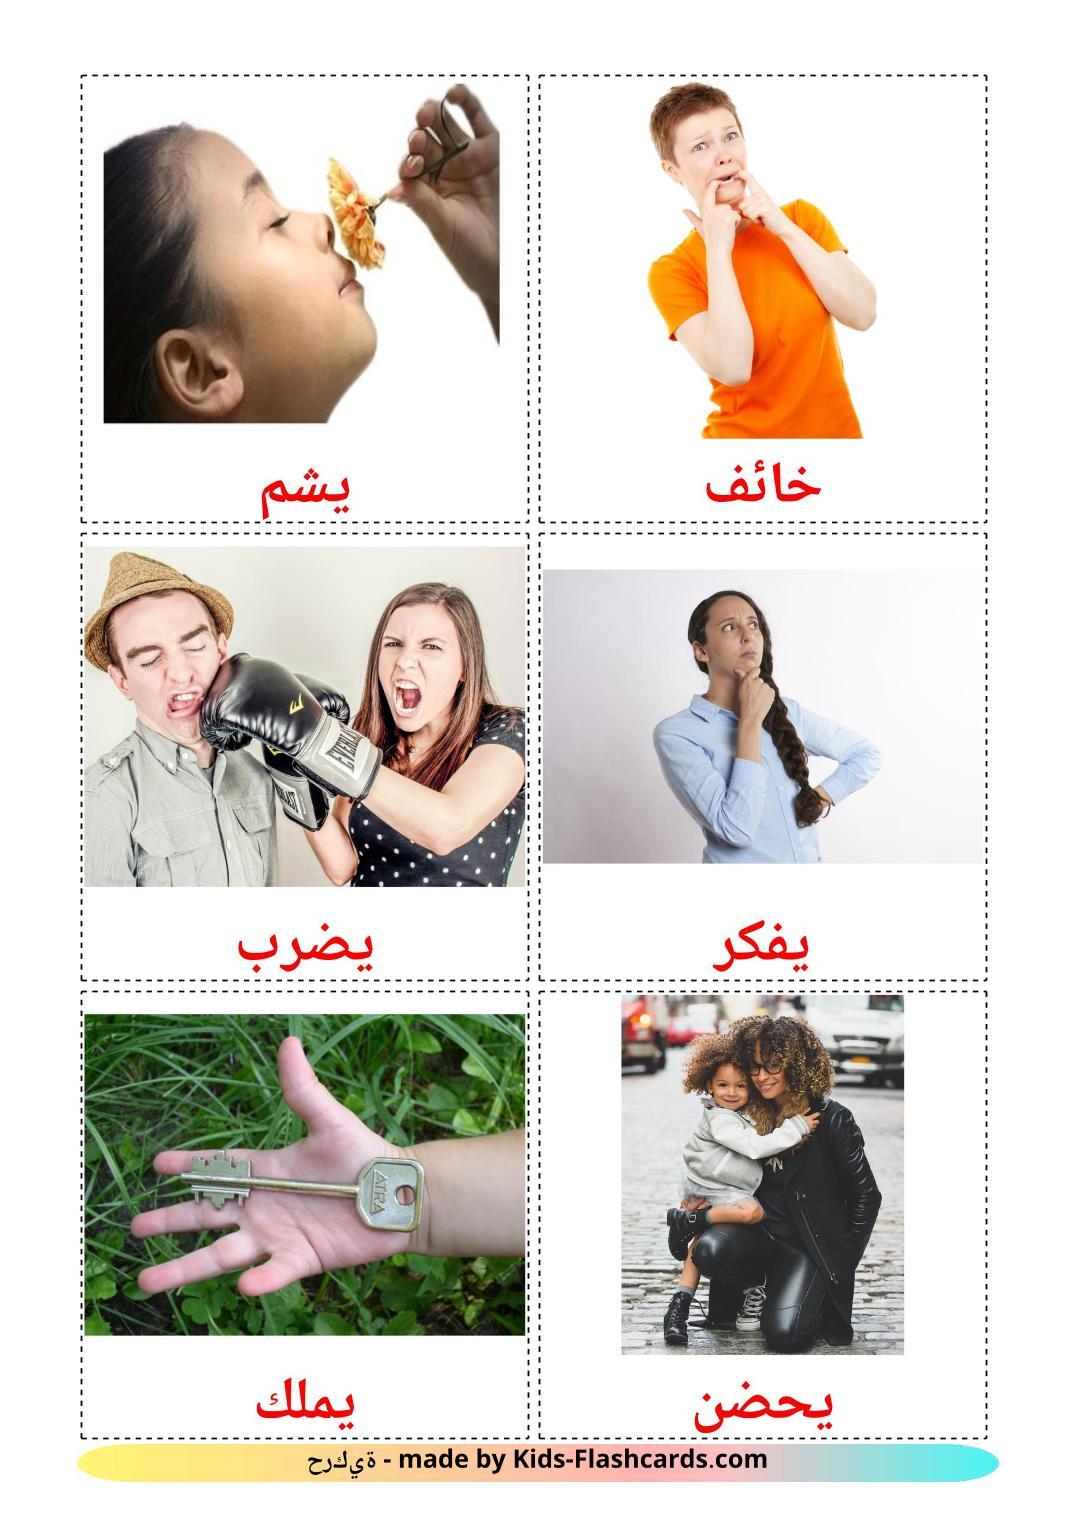 State verbs - 23 Free Printable arabic Flashcards